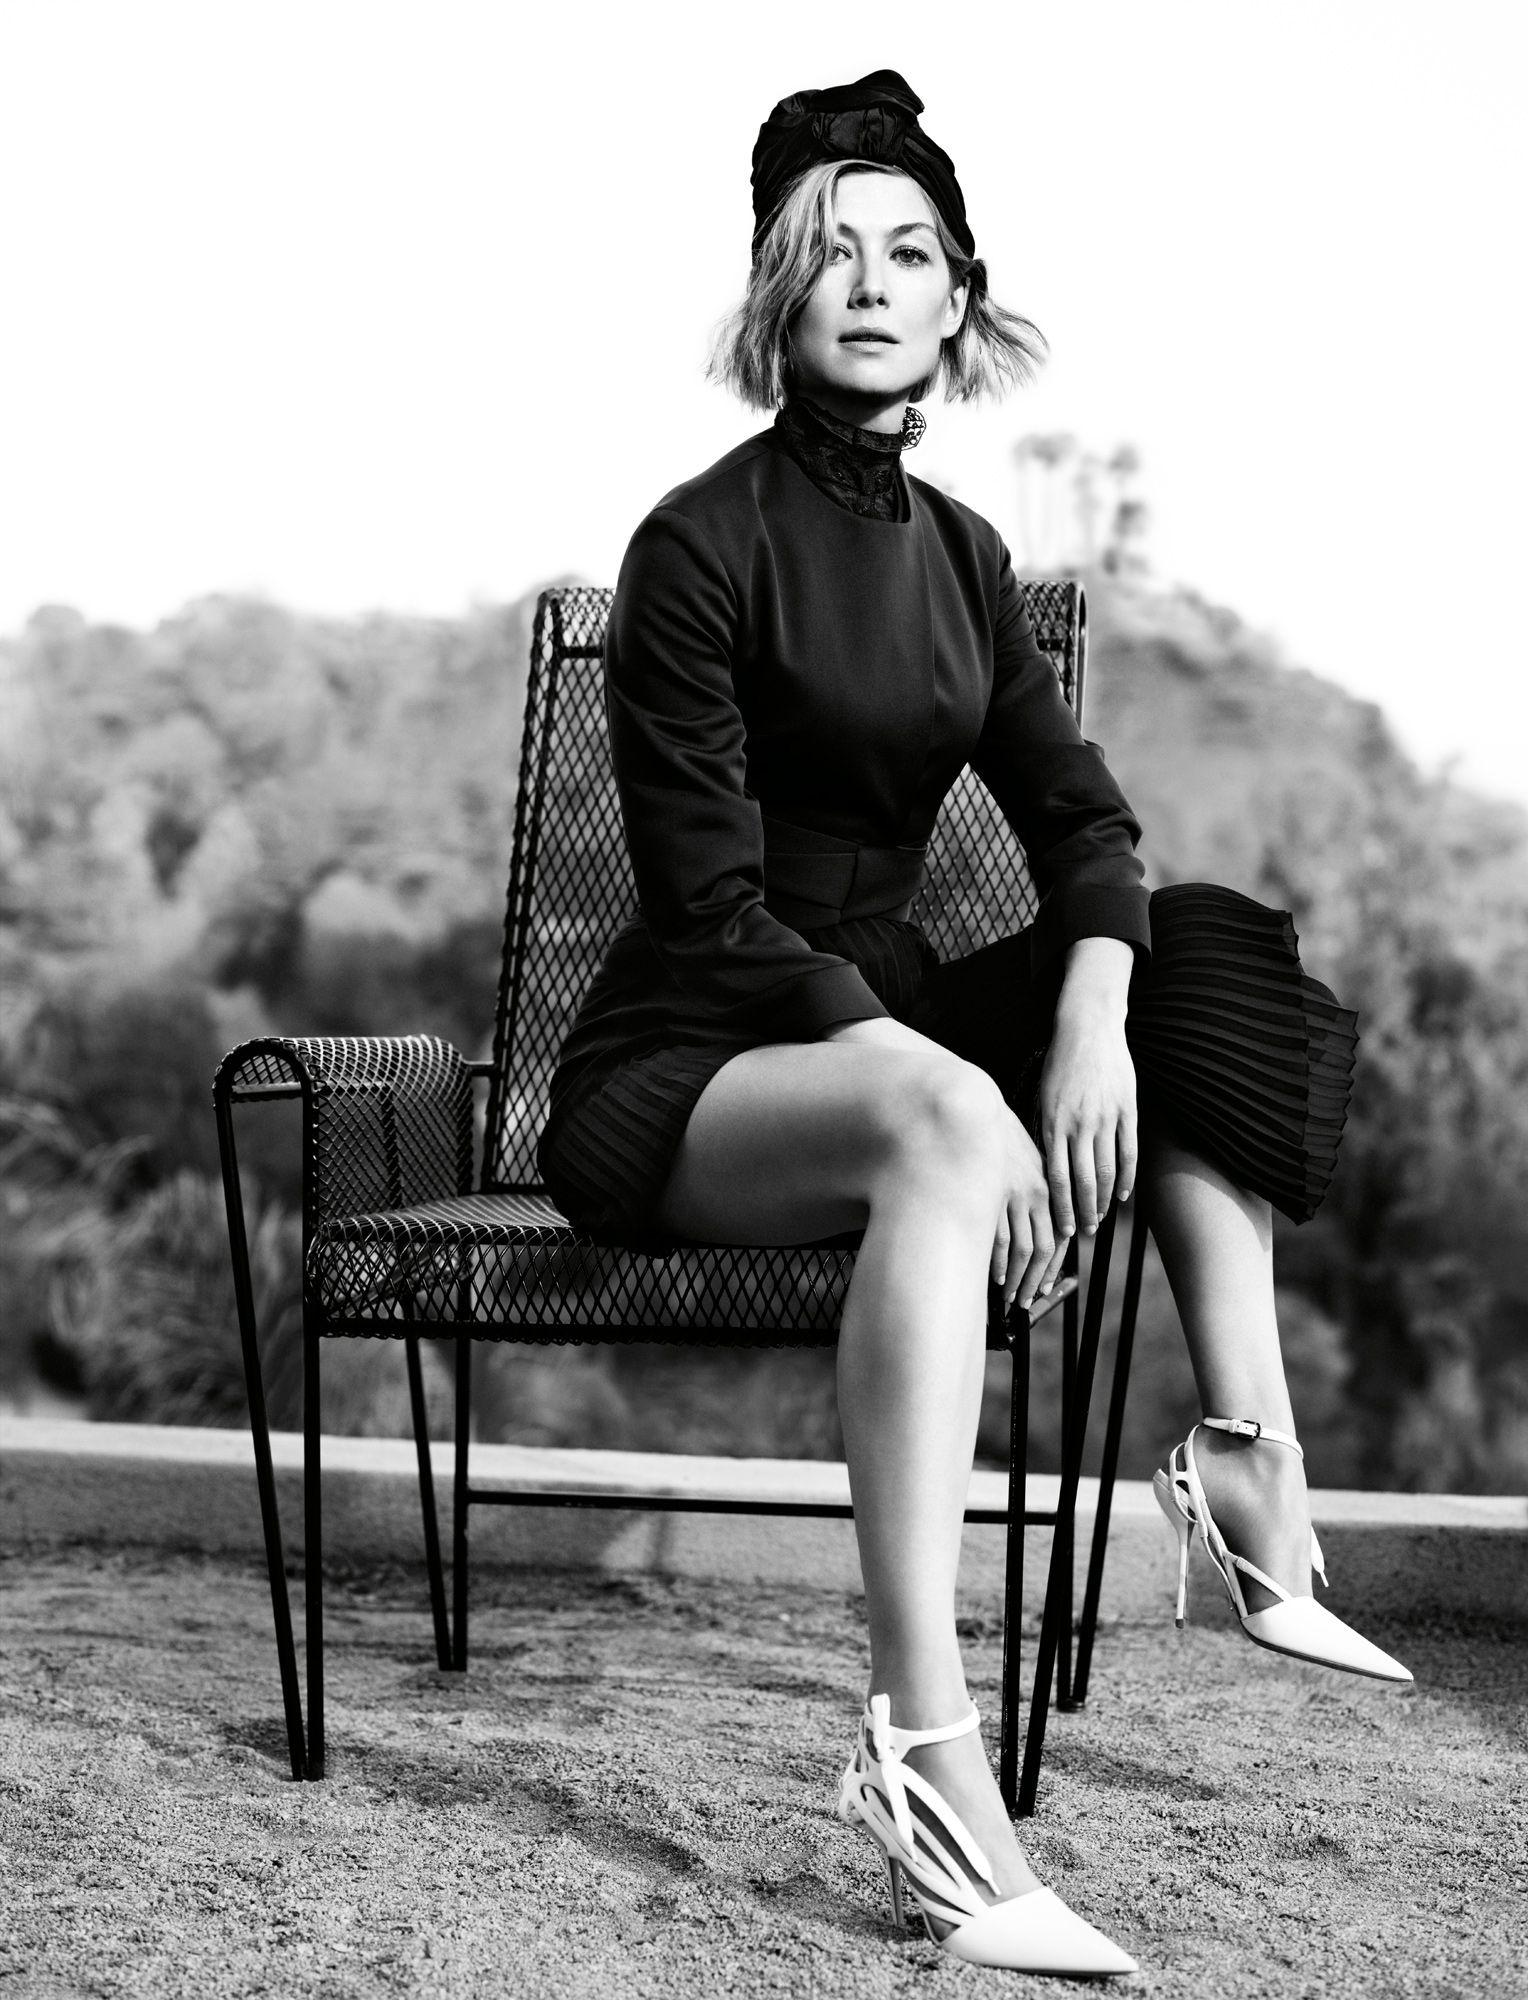 Rosamund Pike: Dark and Twisted - Rosamund Pike Dior Photo by David Fincher